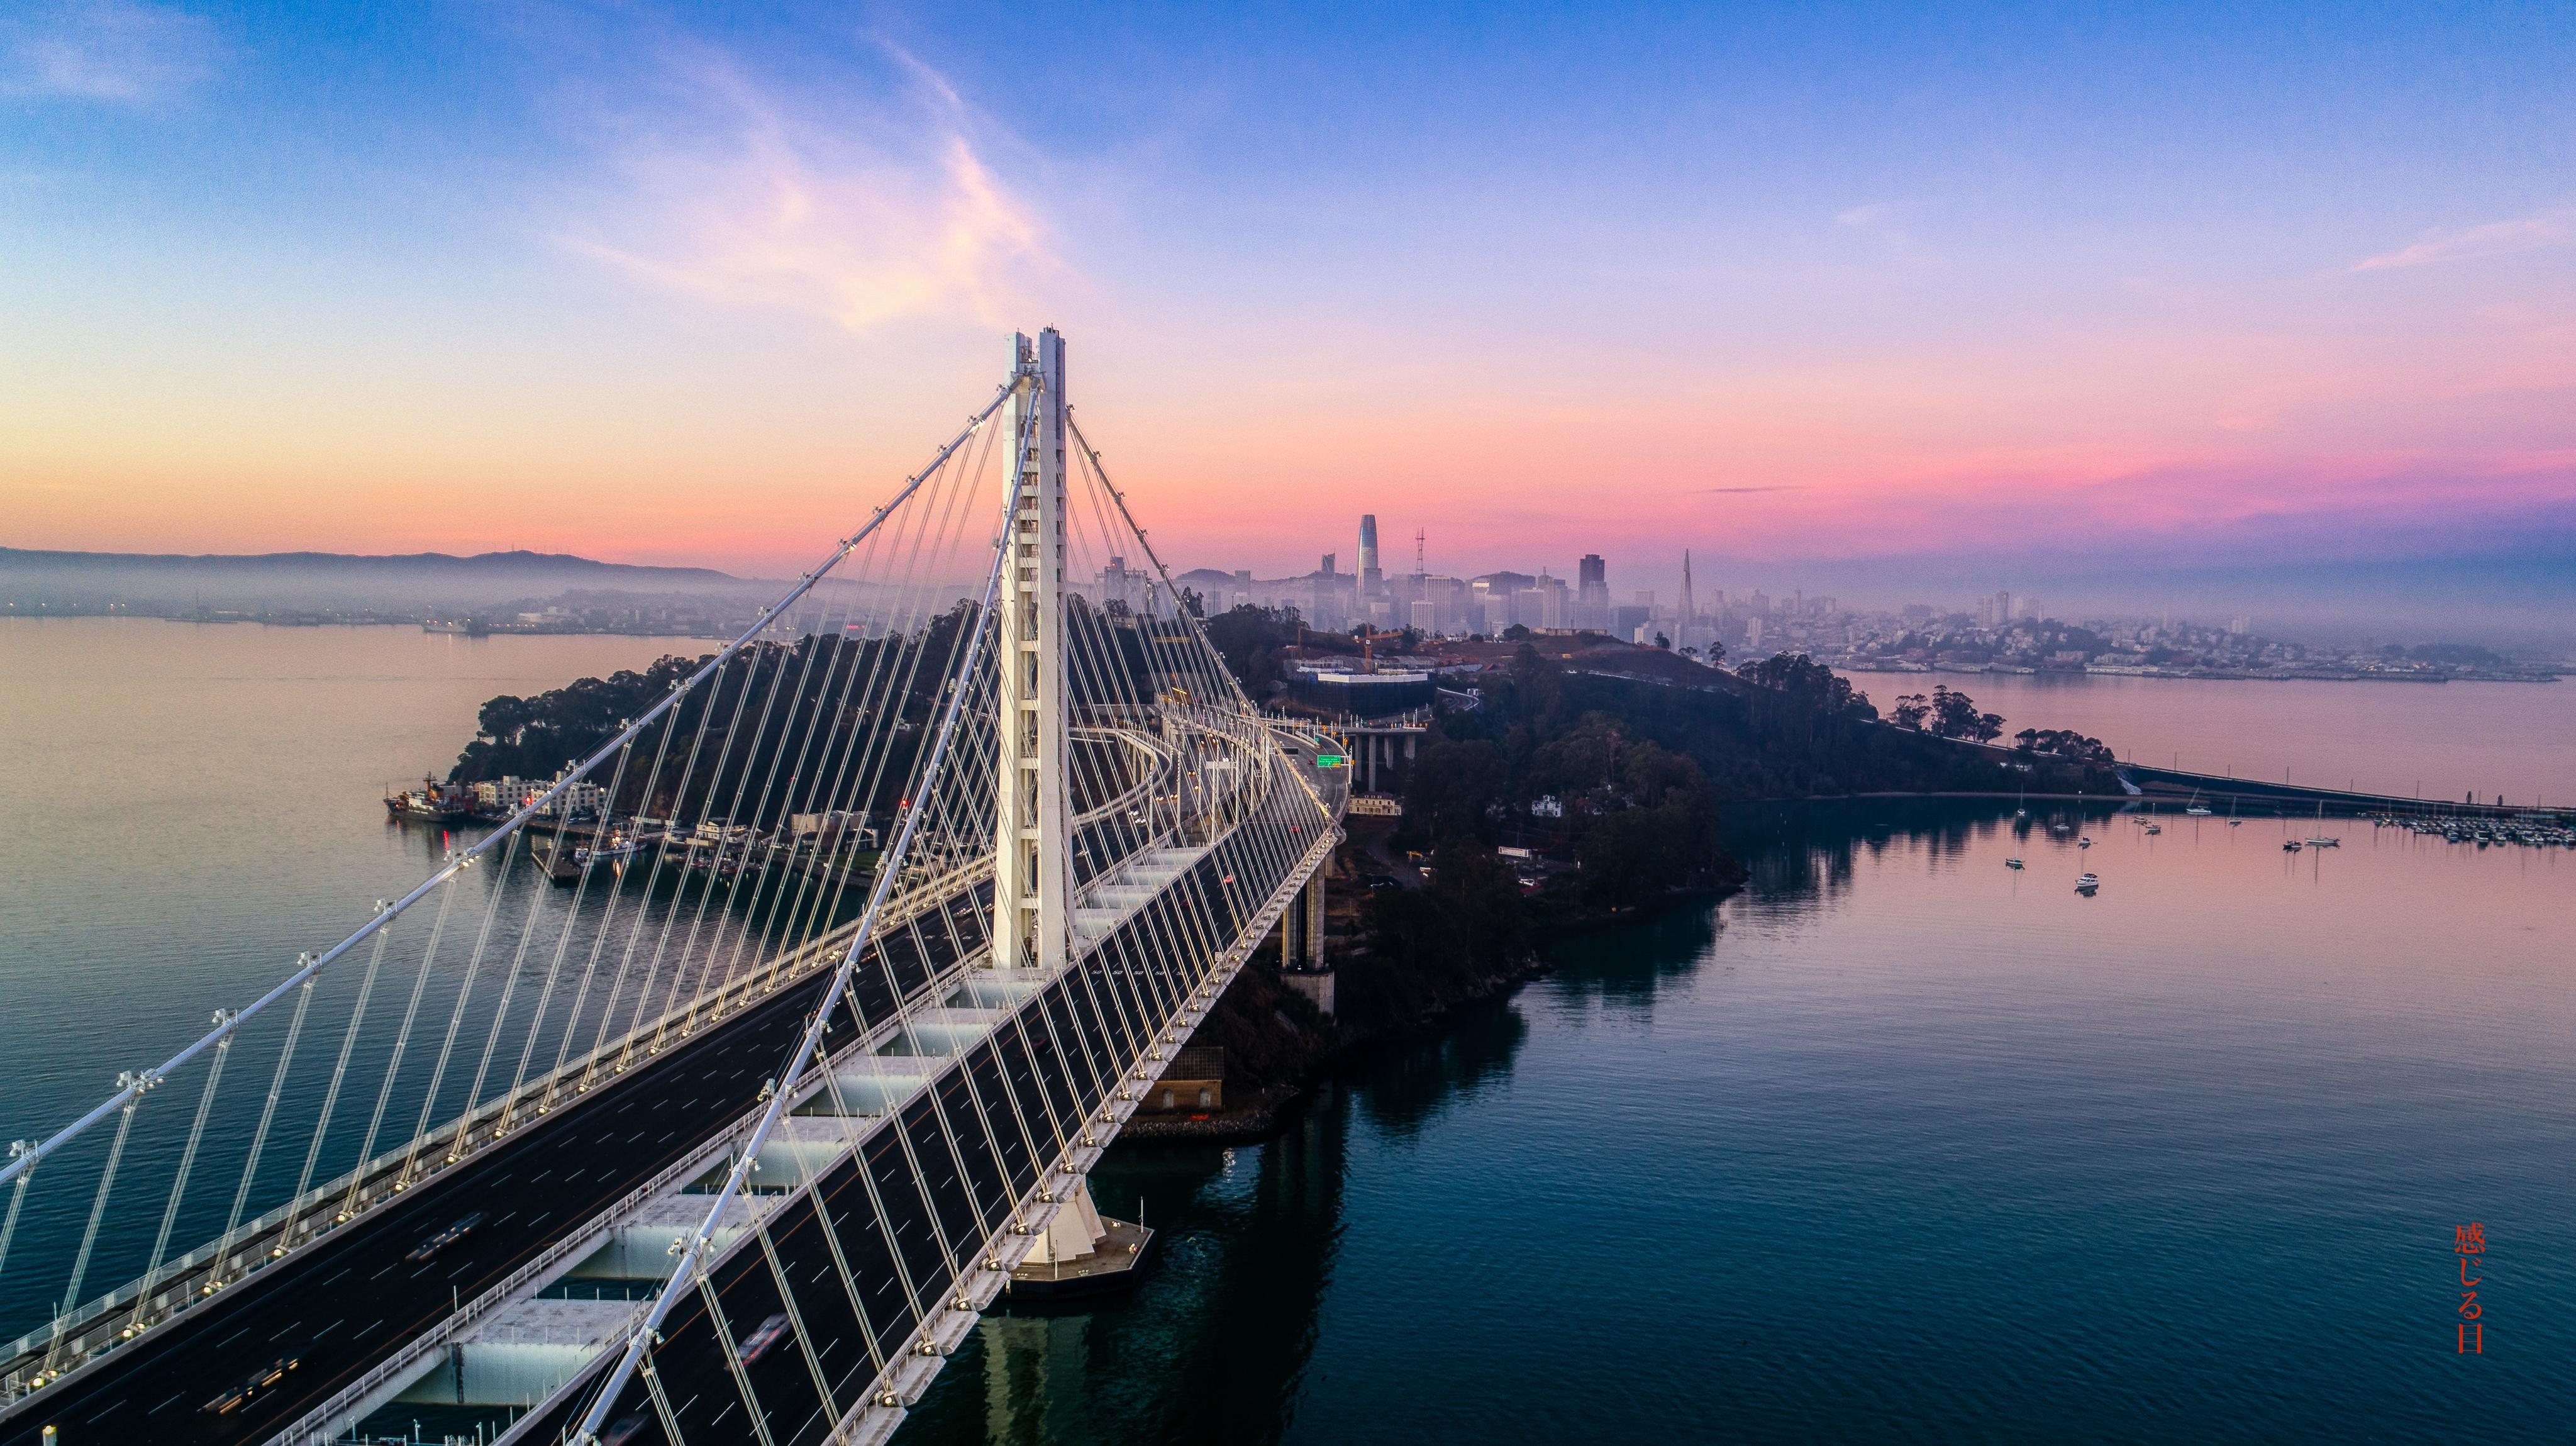 General 4096x2299 San Francisco San Francisco Bay San Francisco-Oakland Bay Bridge sunrise USA west coast